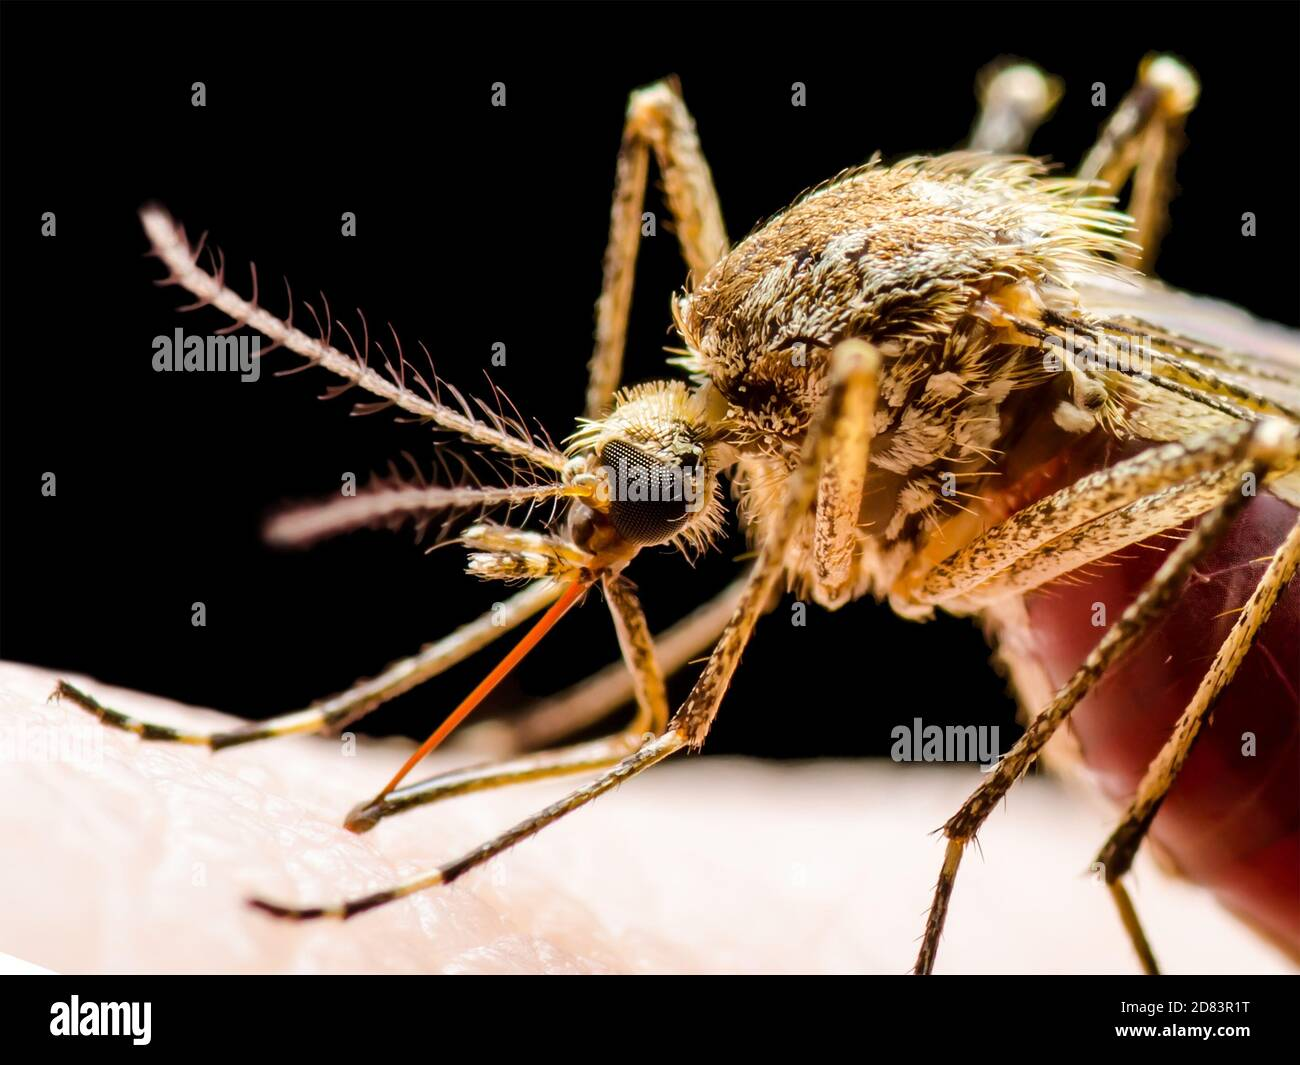 Dangerous Malaria Infected Mosquito Isolated on Black. Leishmaniasis, Encephalitis, Yellow Fever, Dengue, Malaria Disease, Mayaro or Zika Virus Infect Stock Photo